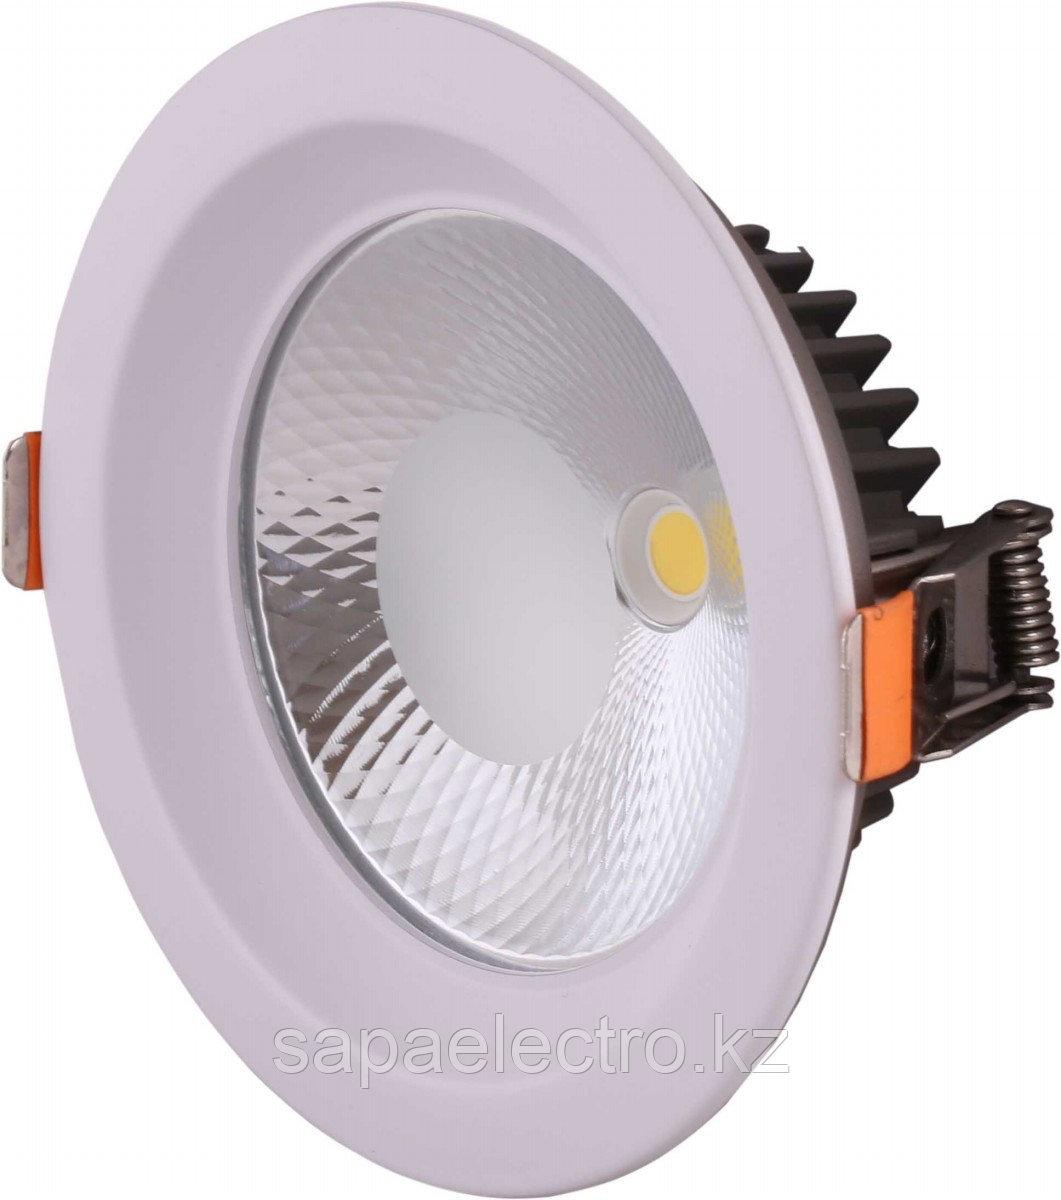 Sv.DOWNLIGHT LED AVENA NEW COB 10W WH 6000K(TT)40